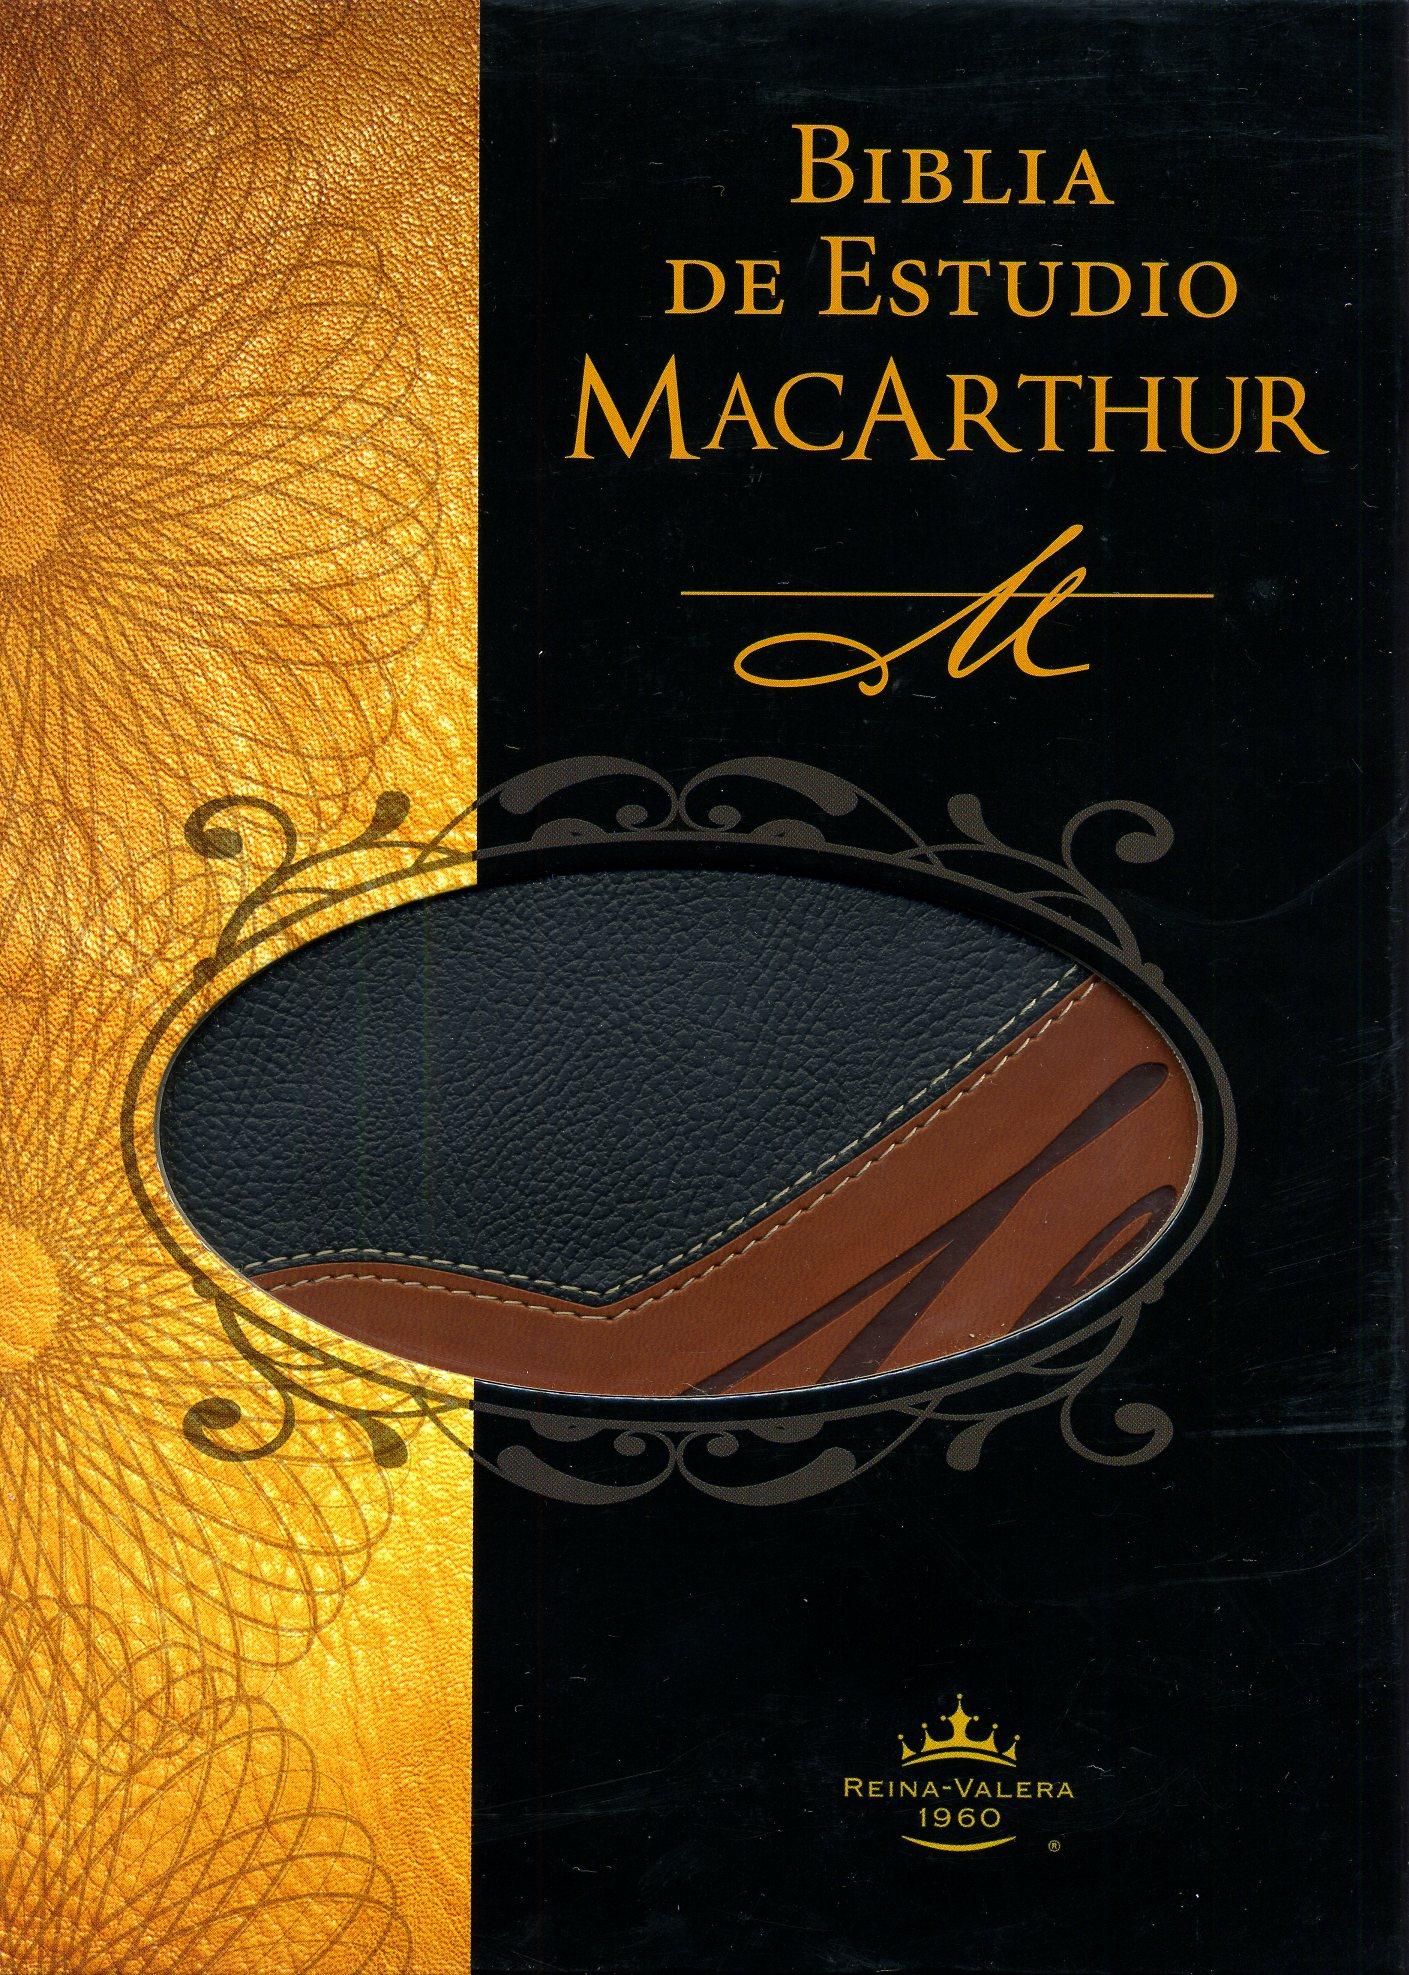 Biblia de Estudio MacArthur Duotono